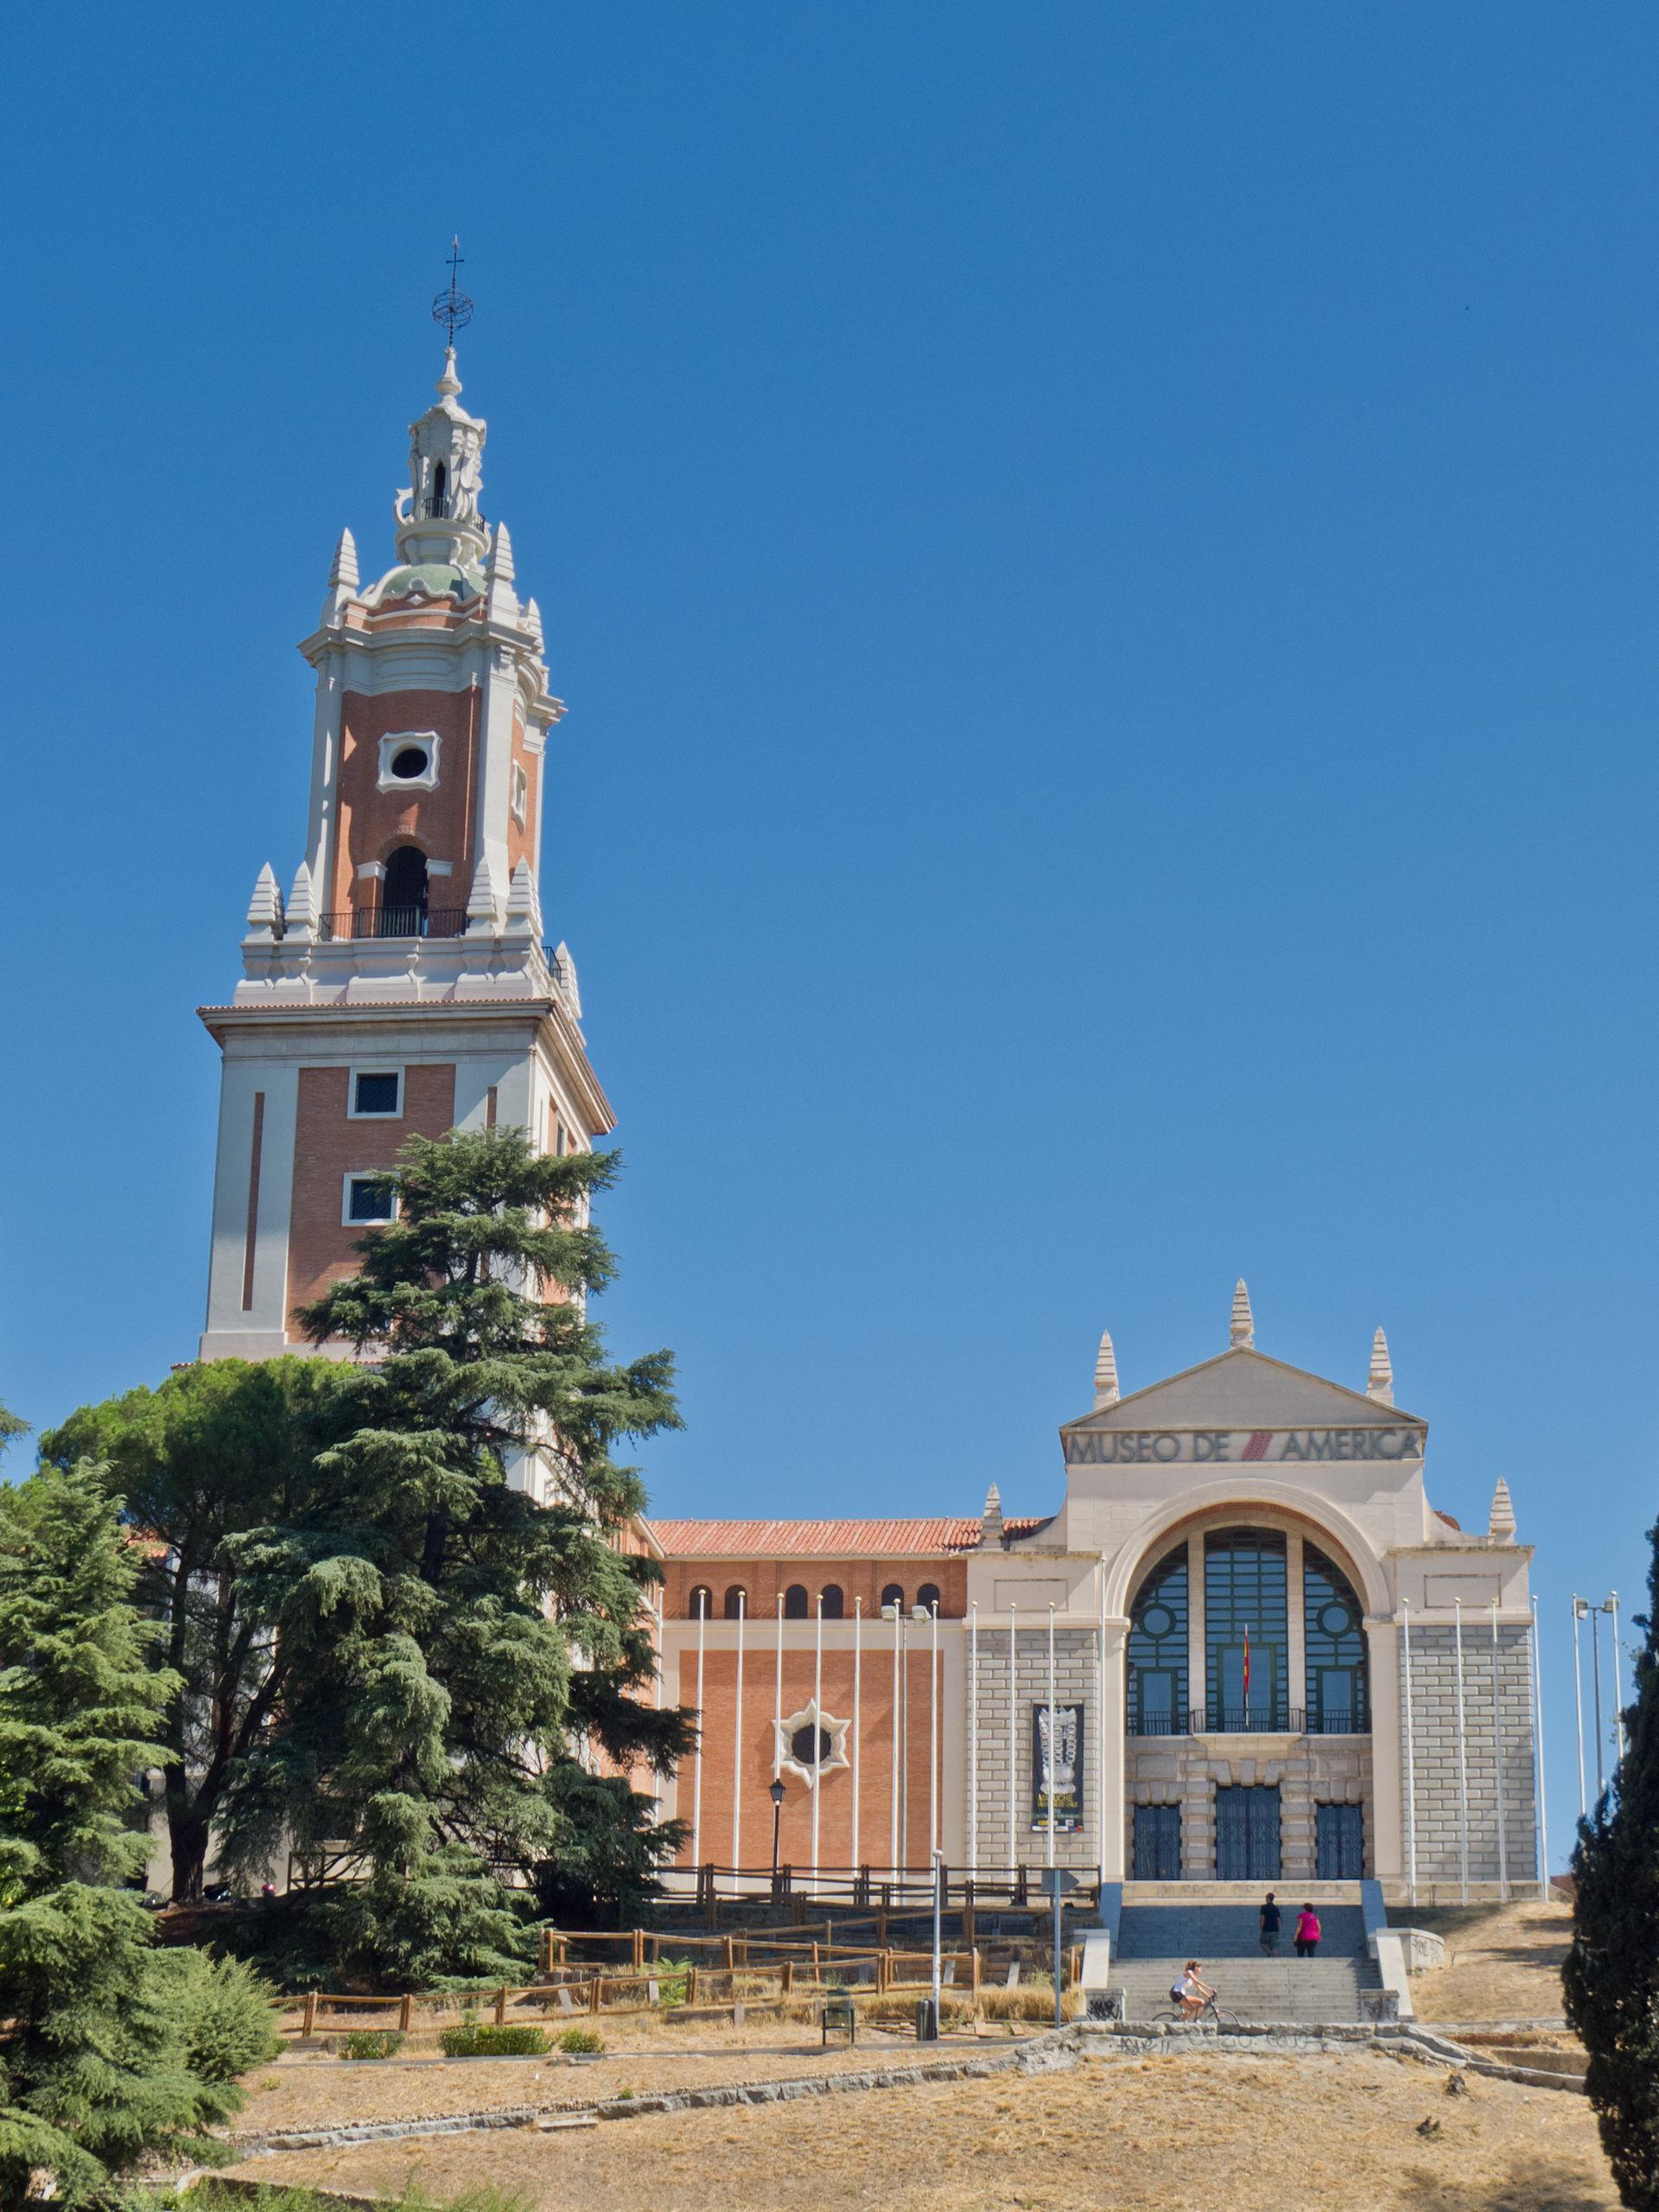 Museu da am rica madrid wikip dia a enciclop dia livre - Montadores de pladur en madrid ...